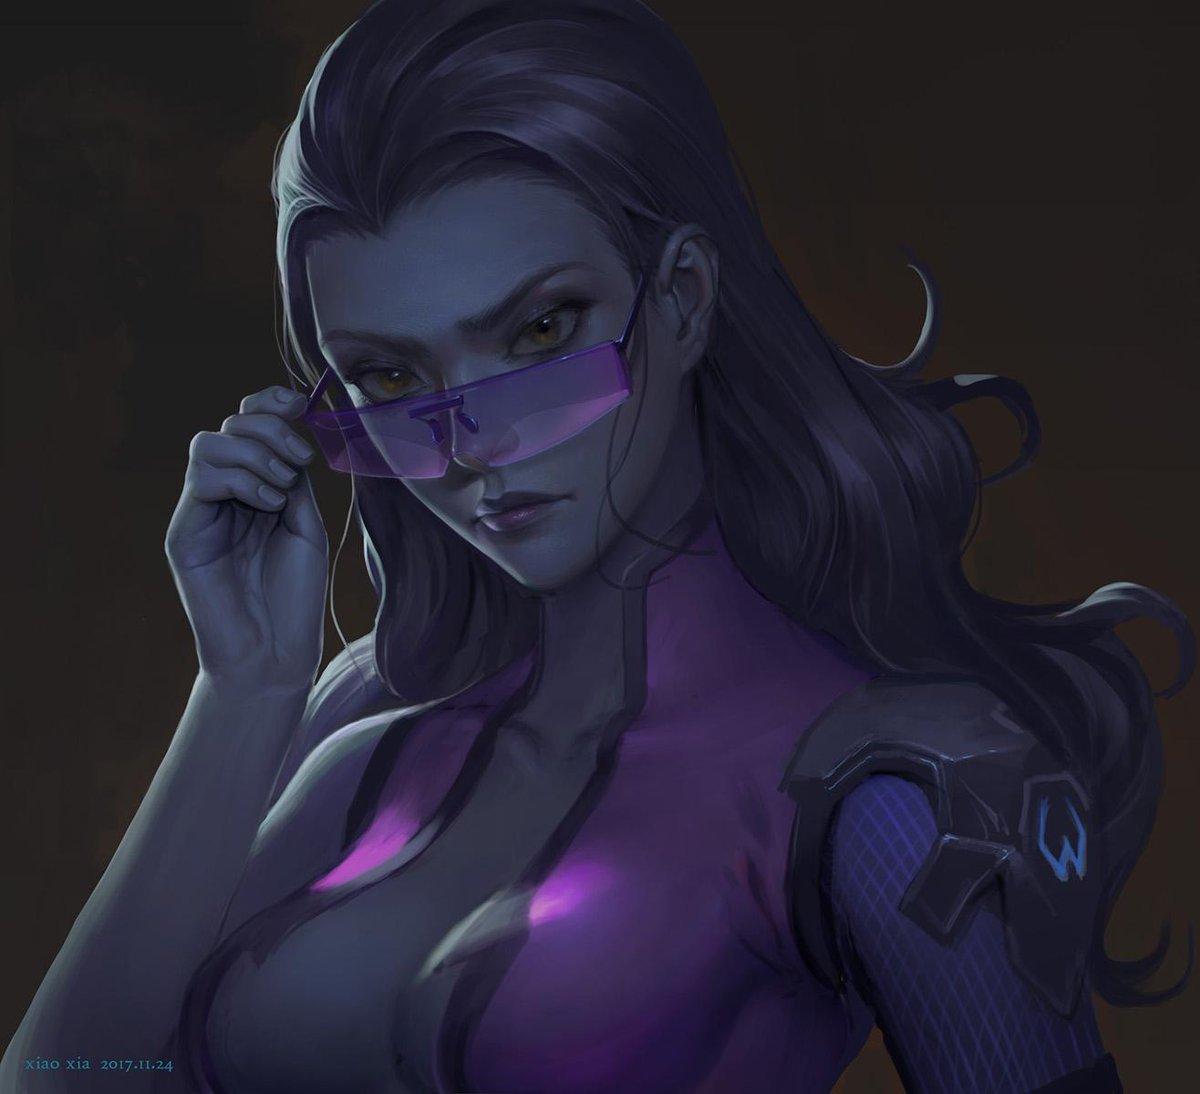 Artwork by 暴走小虾 http://goo.gl/rhMb3L #Widowmaker #Overwatch